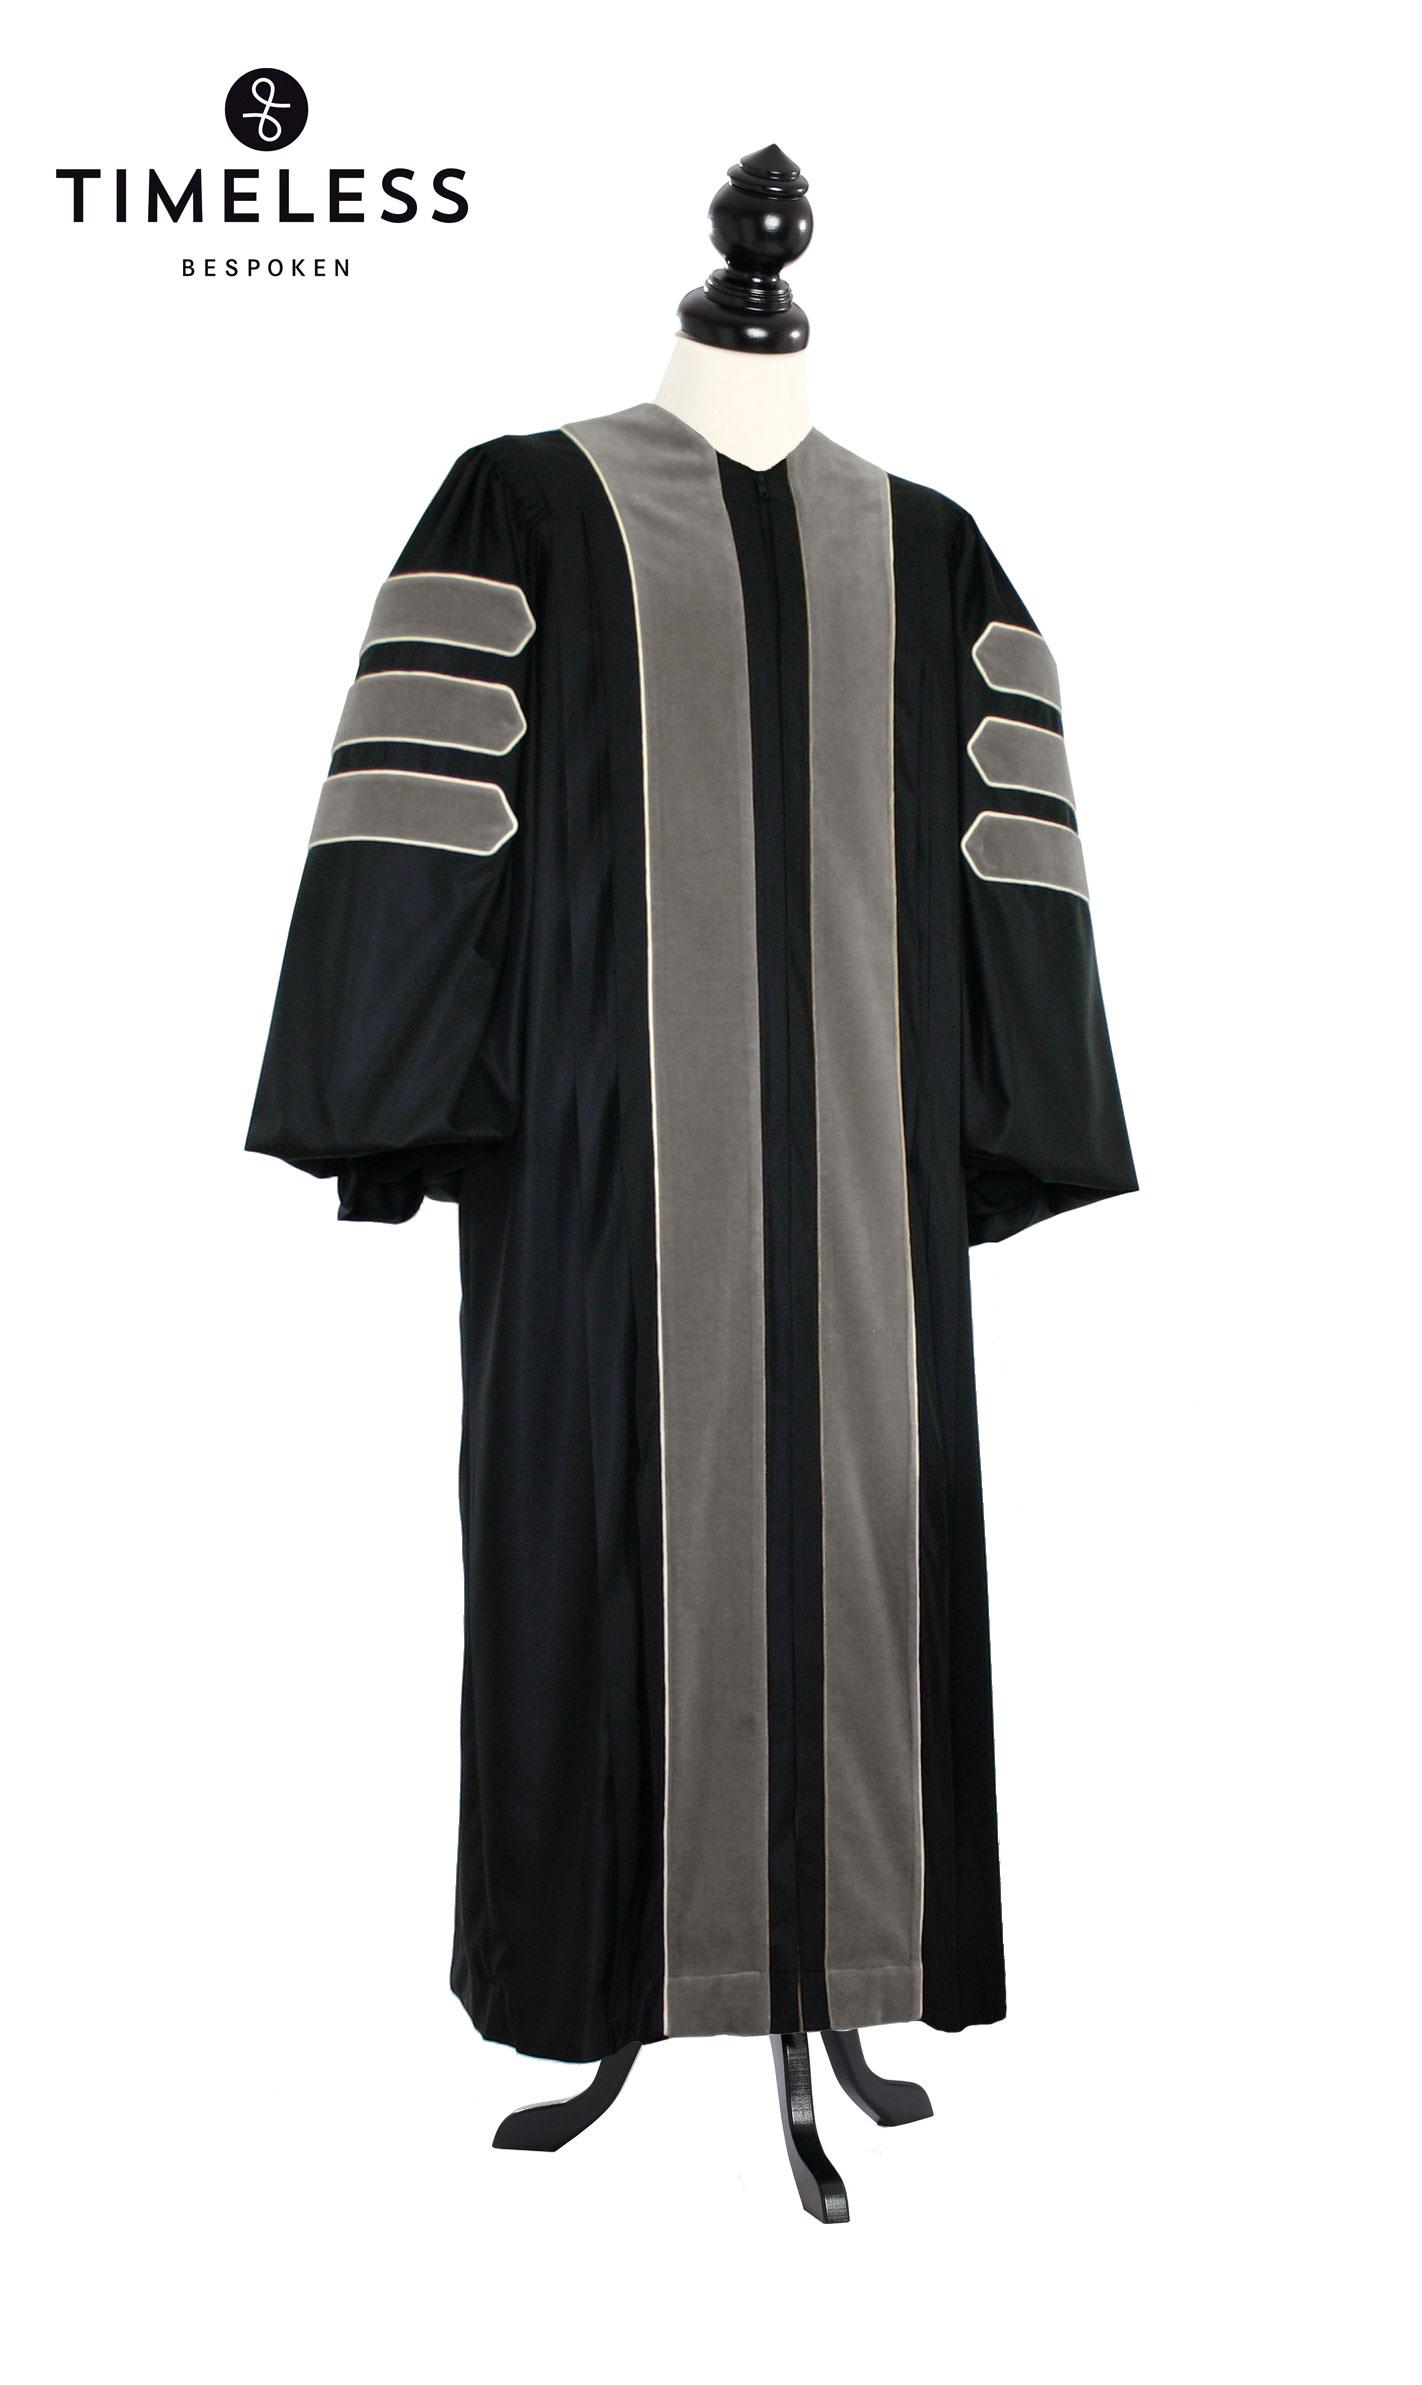 Doktortalar Tierheilkunde - TIMELESS silver wool